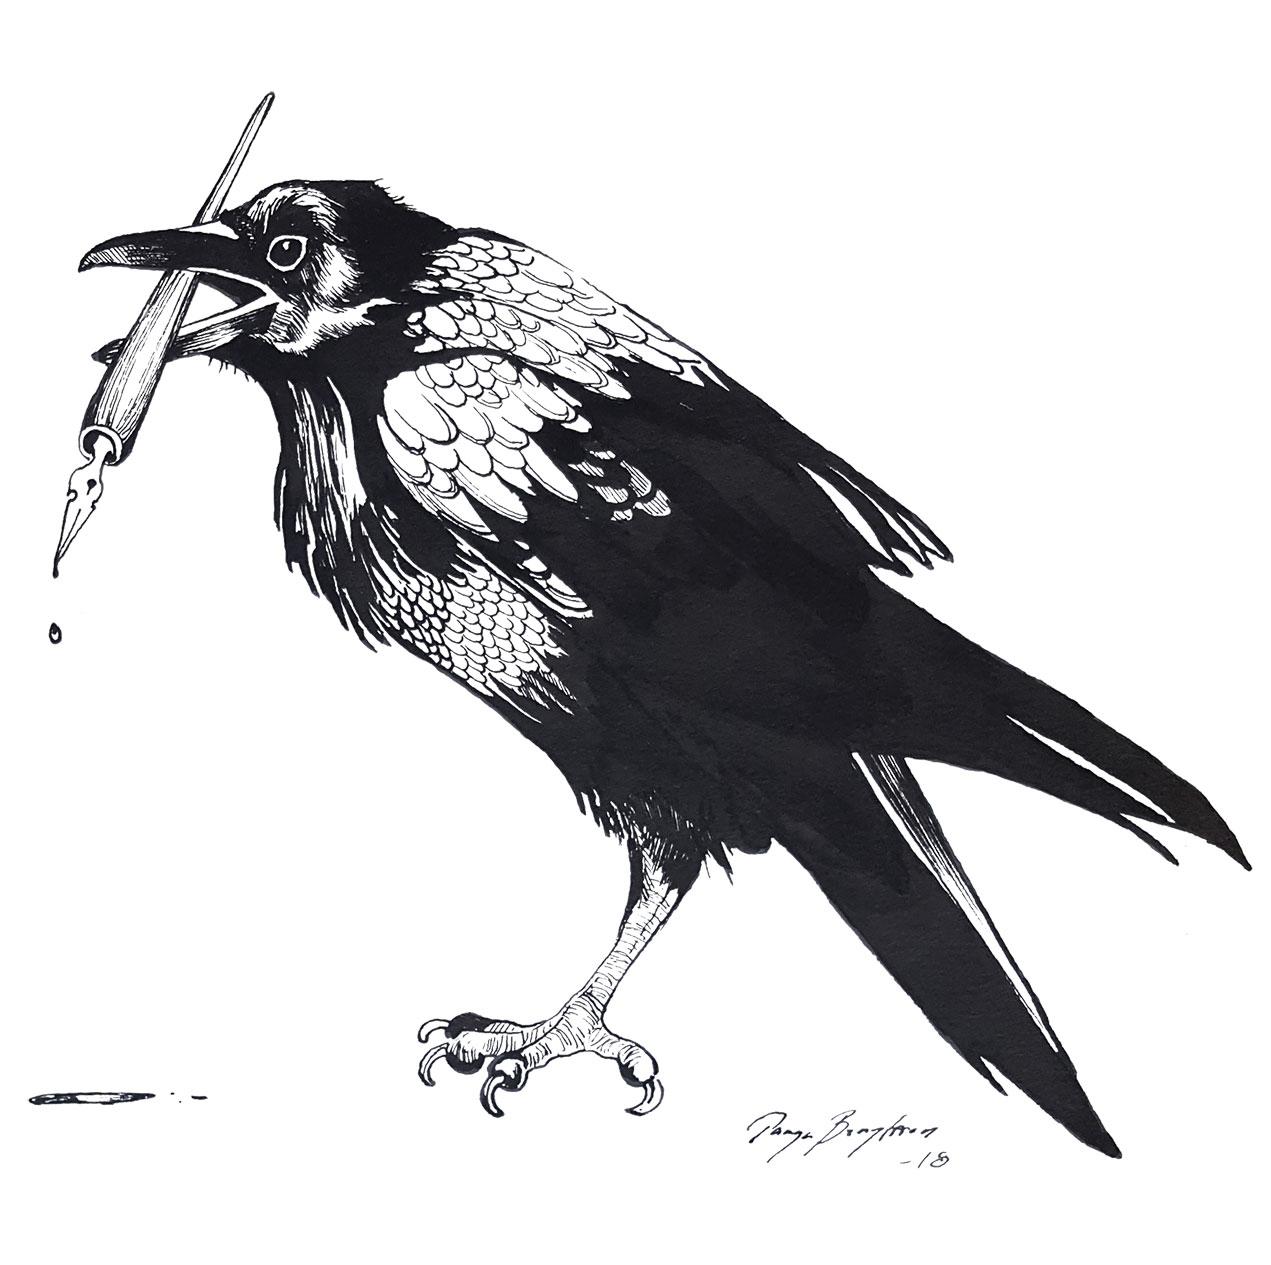 Raven drawn in ink holding a pen in its beak.